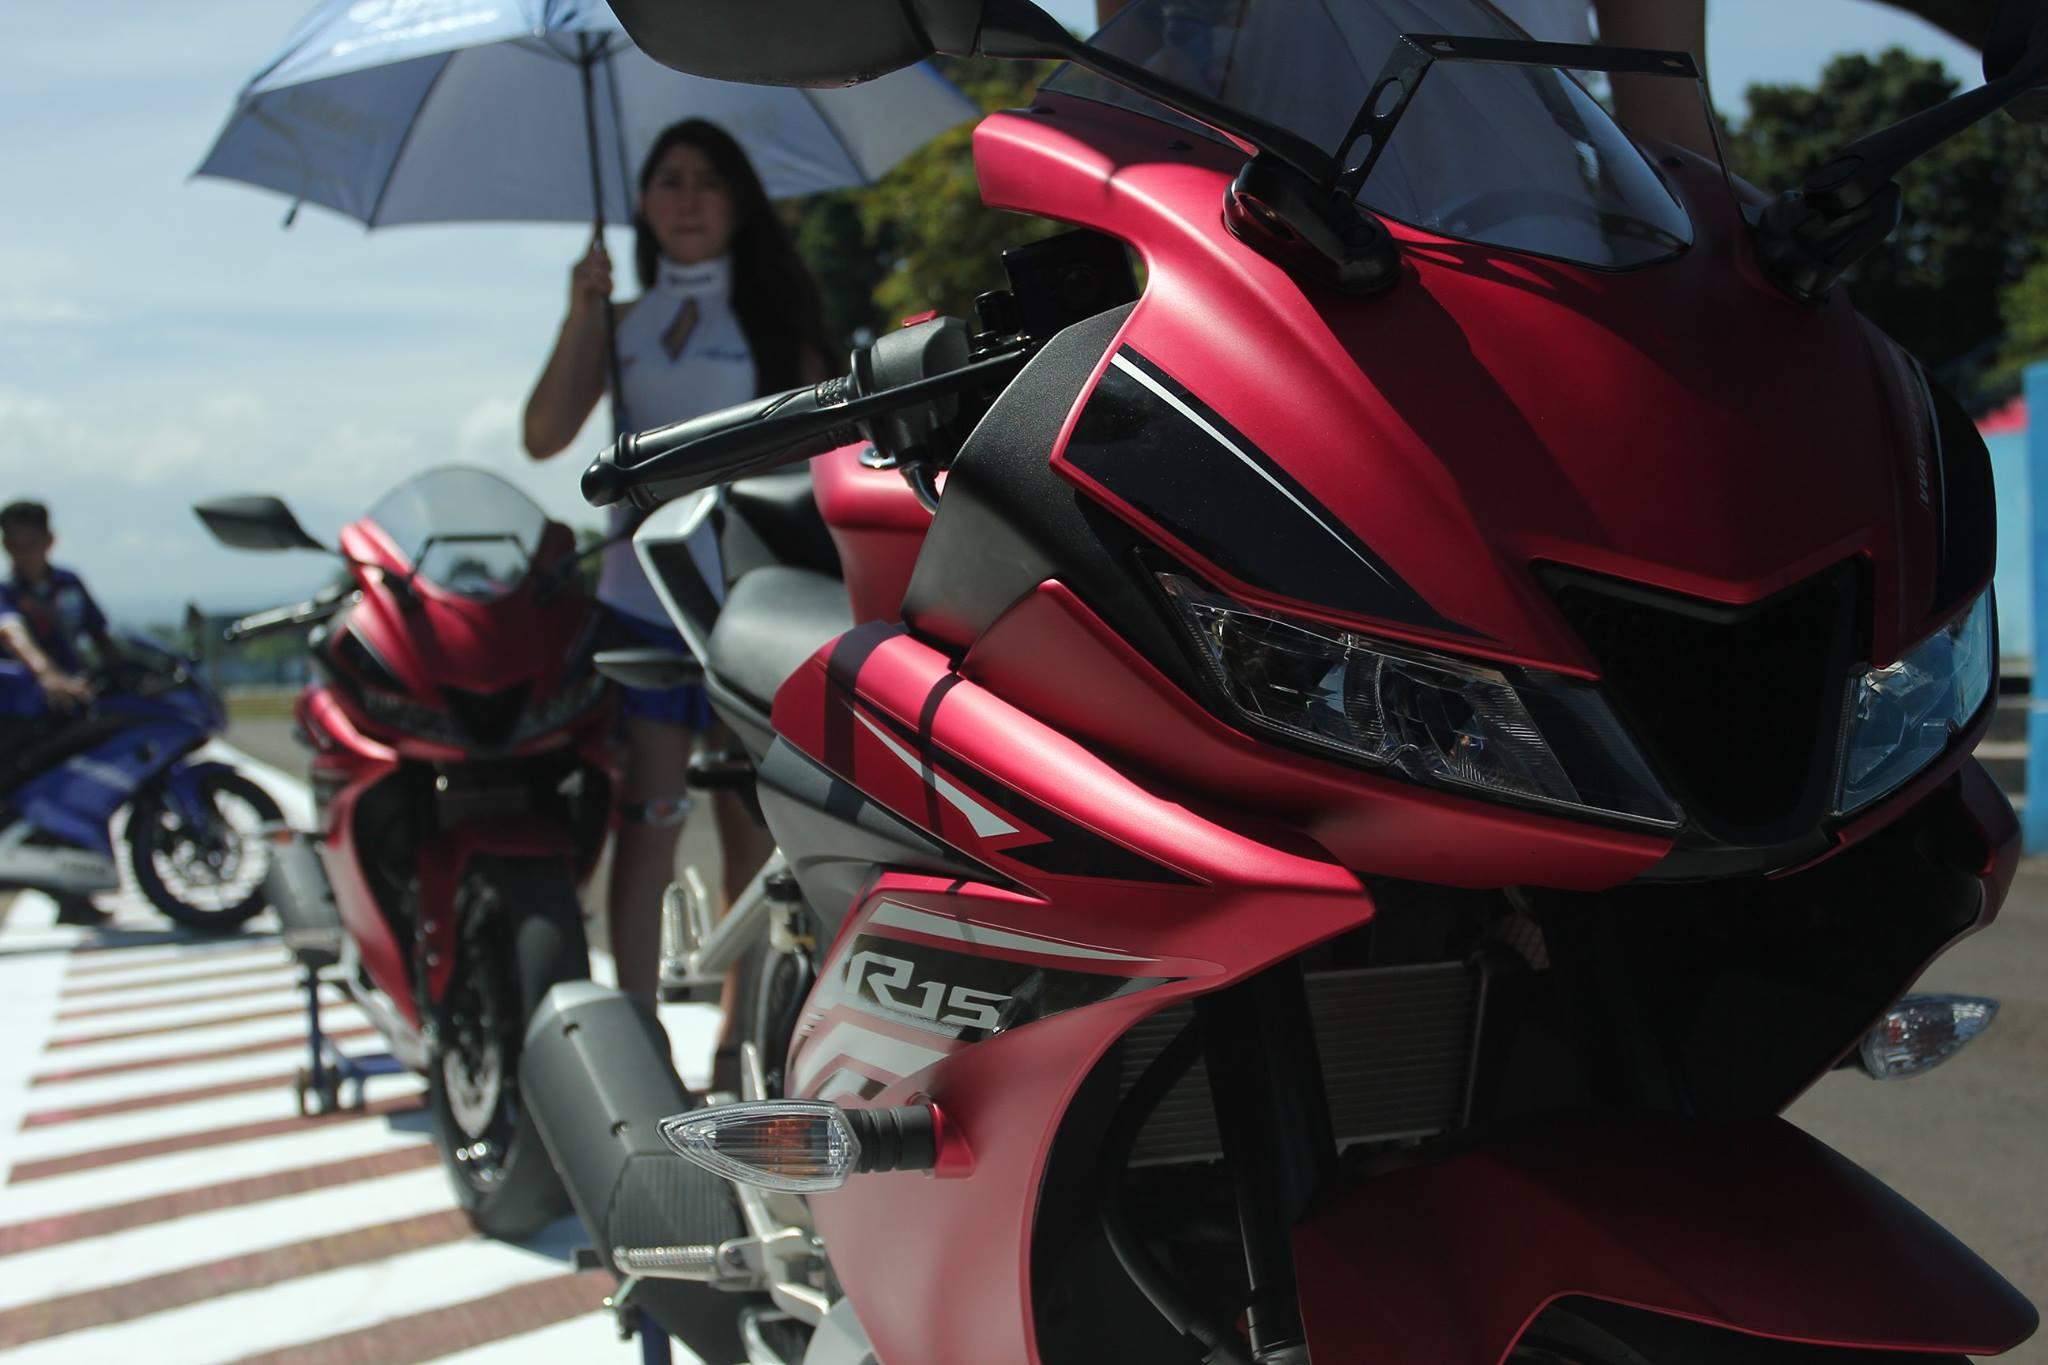 Yamaha R15 V3 Price Philippines Of 2017 Yamaha R15 V3 0 Unveiled Most Powerful Bike